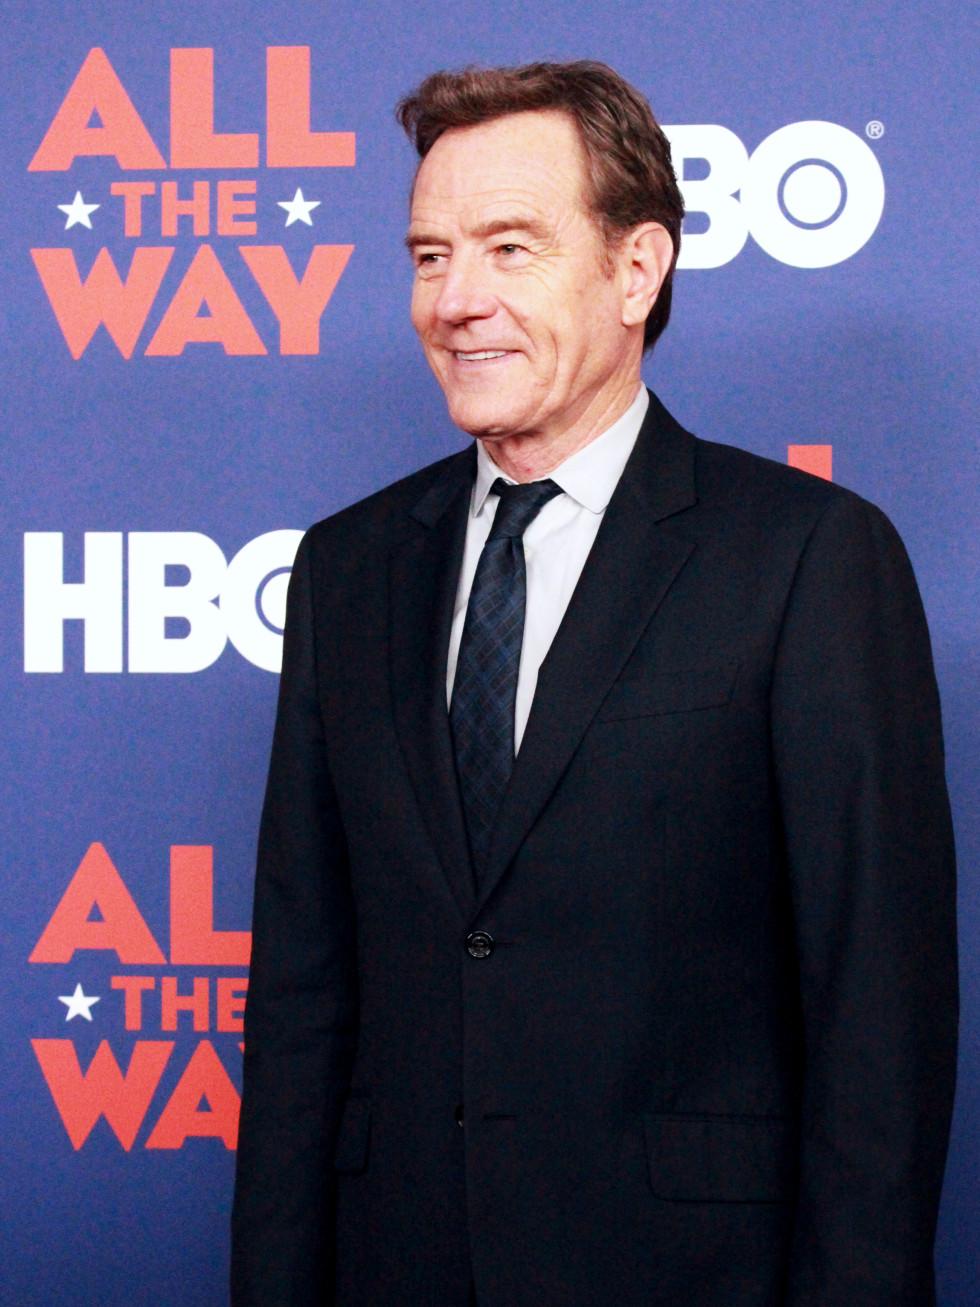 Austin premiere HBO film All the Way LBJ red carpet Bryan Cranston Lyndon B Johnson